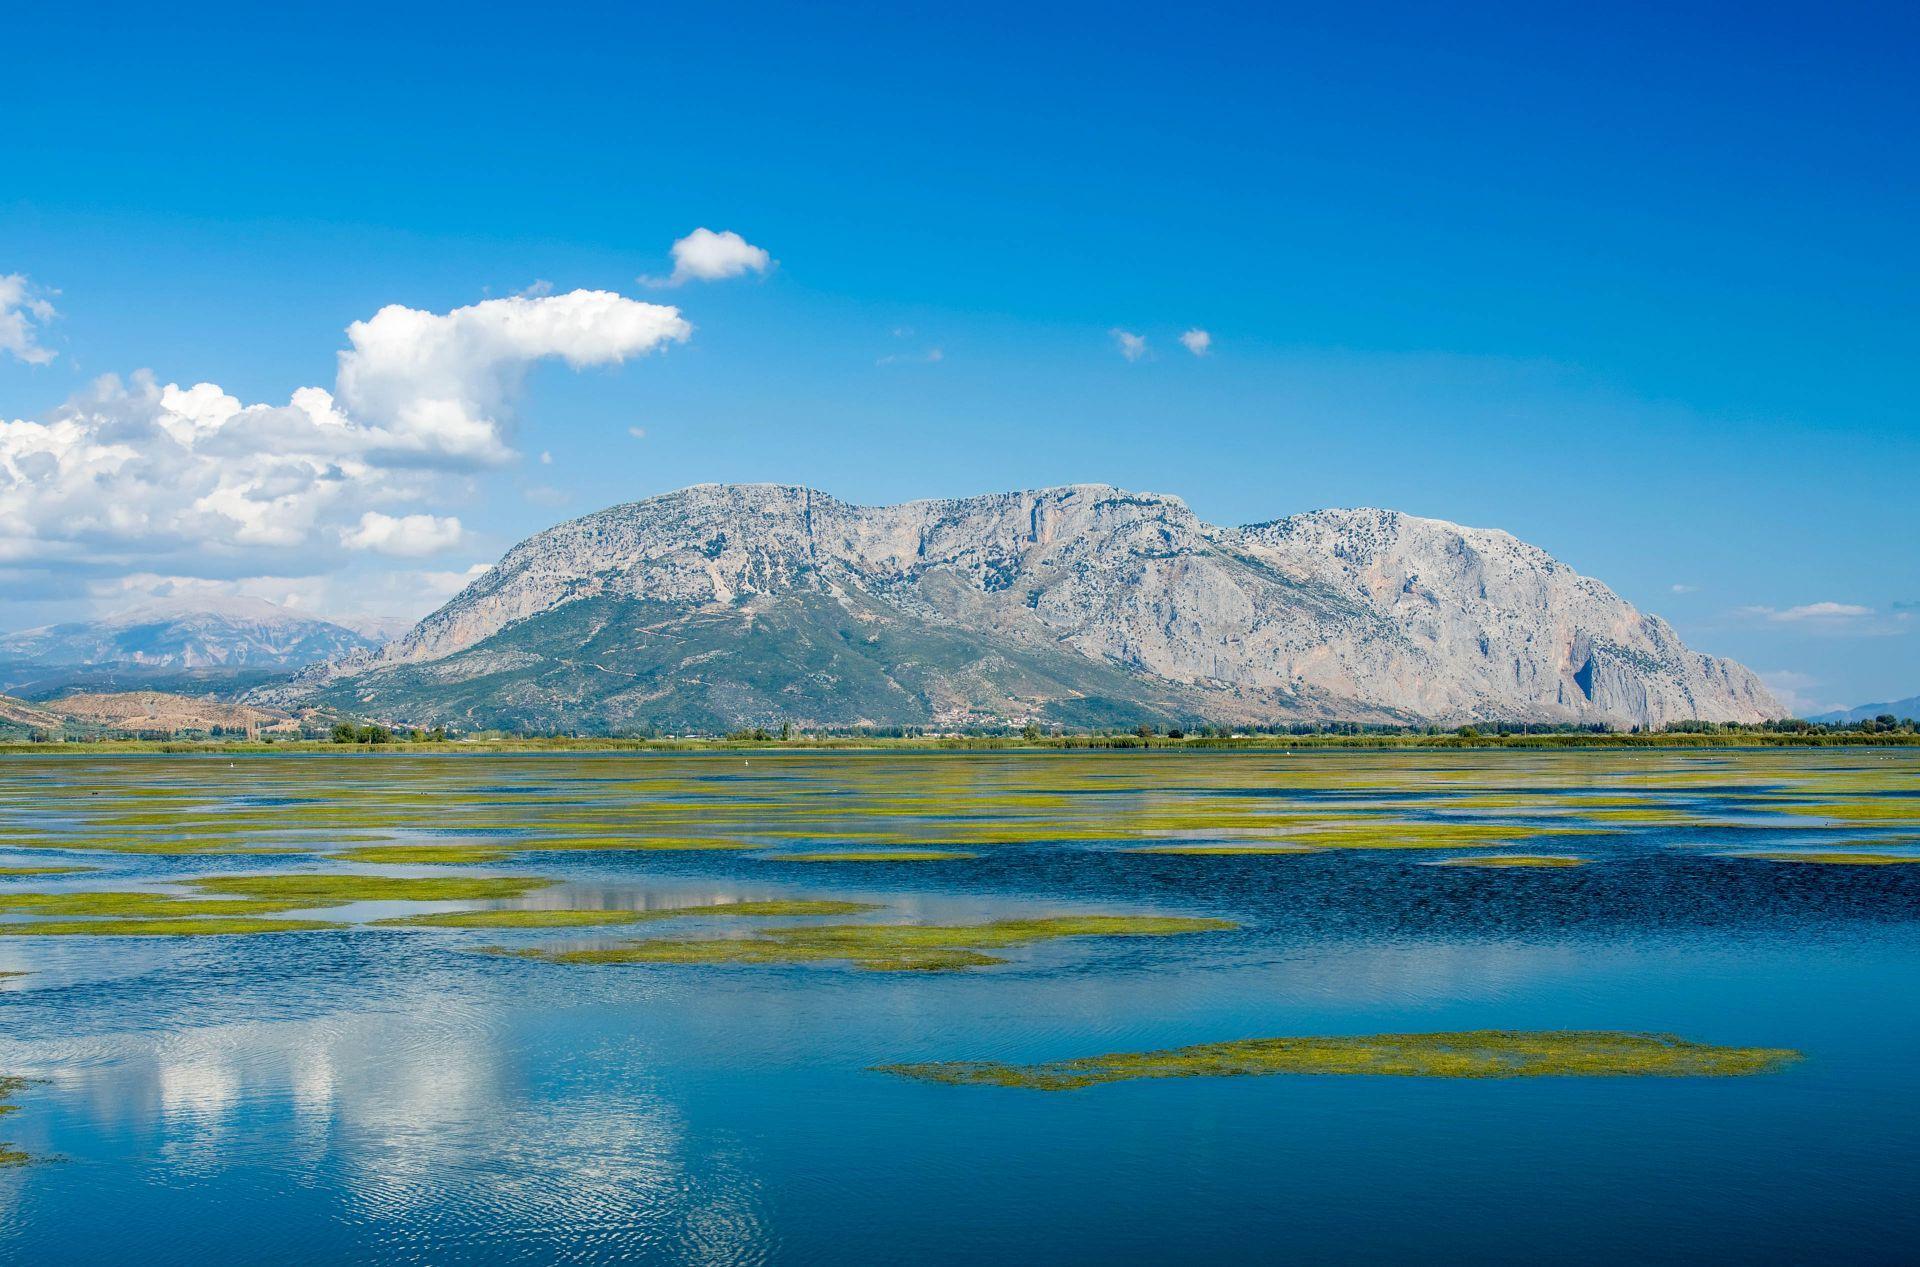 Sterea: The sea lake of Mesolongi